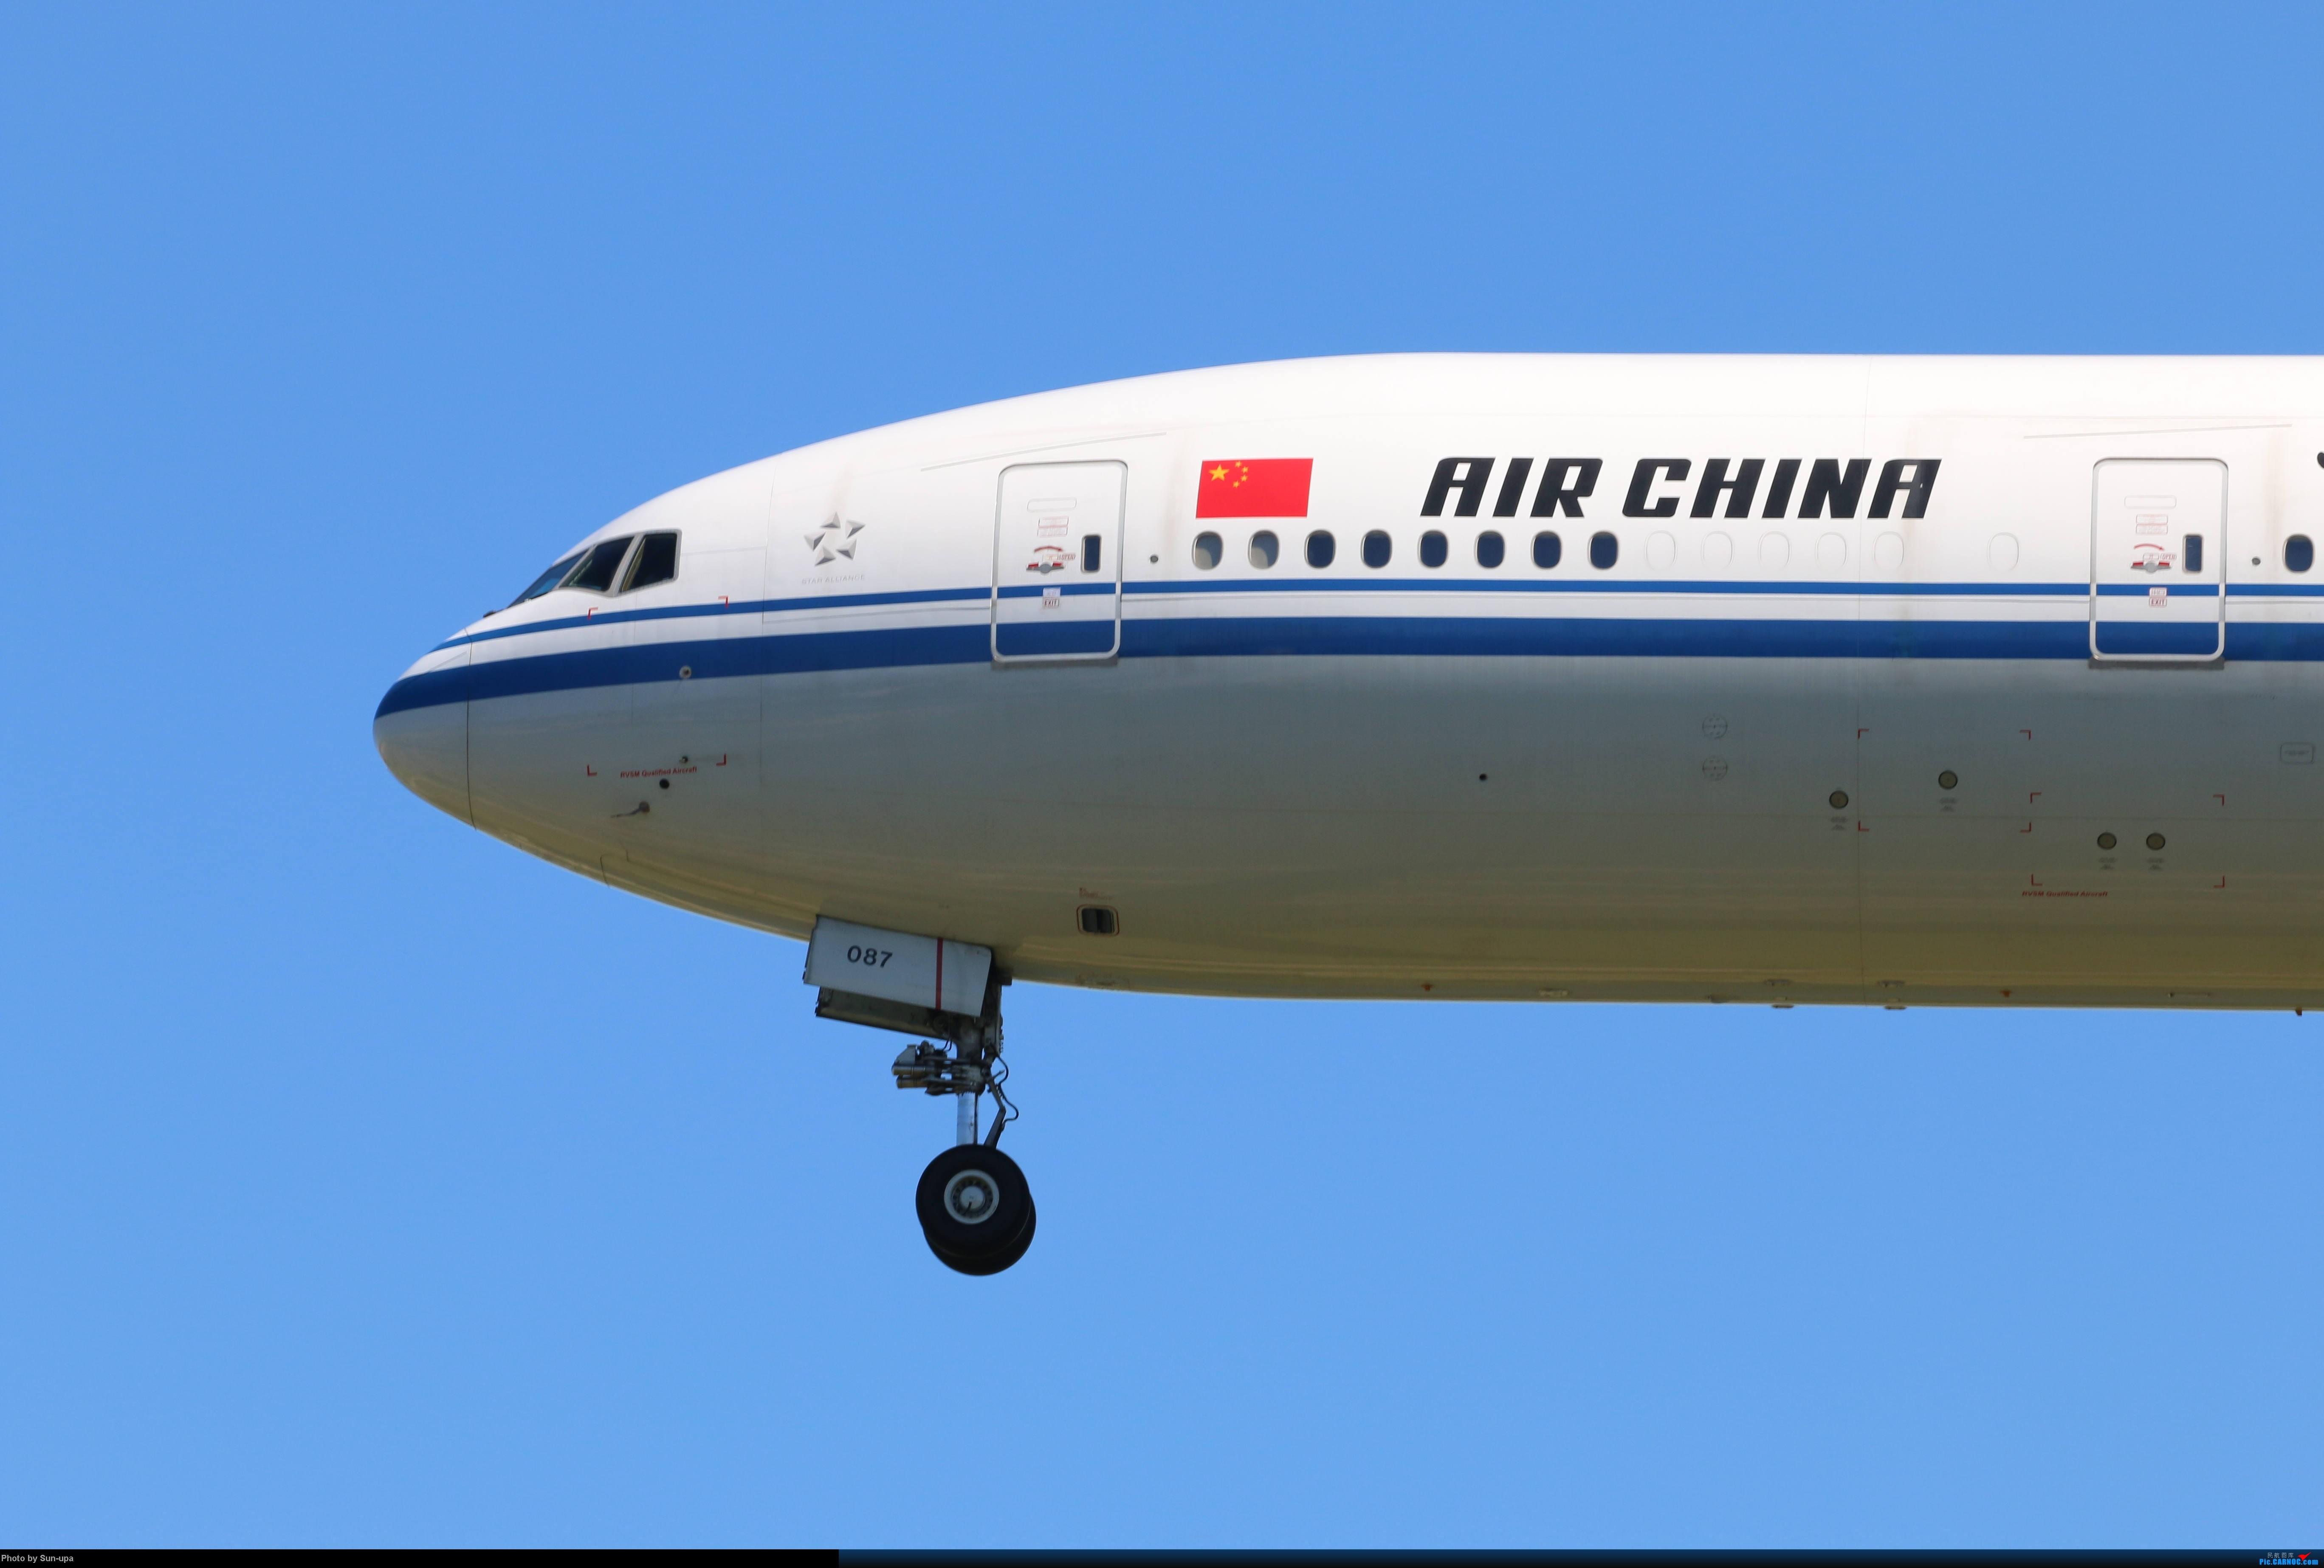 Re:[原创]天气好 去拍机!2014.9.8PEK拍机(厦航787) BOEING 777-300ER B-2087 中国北京首都机场